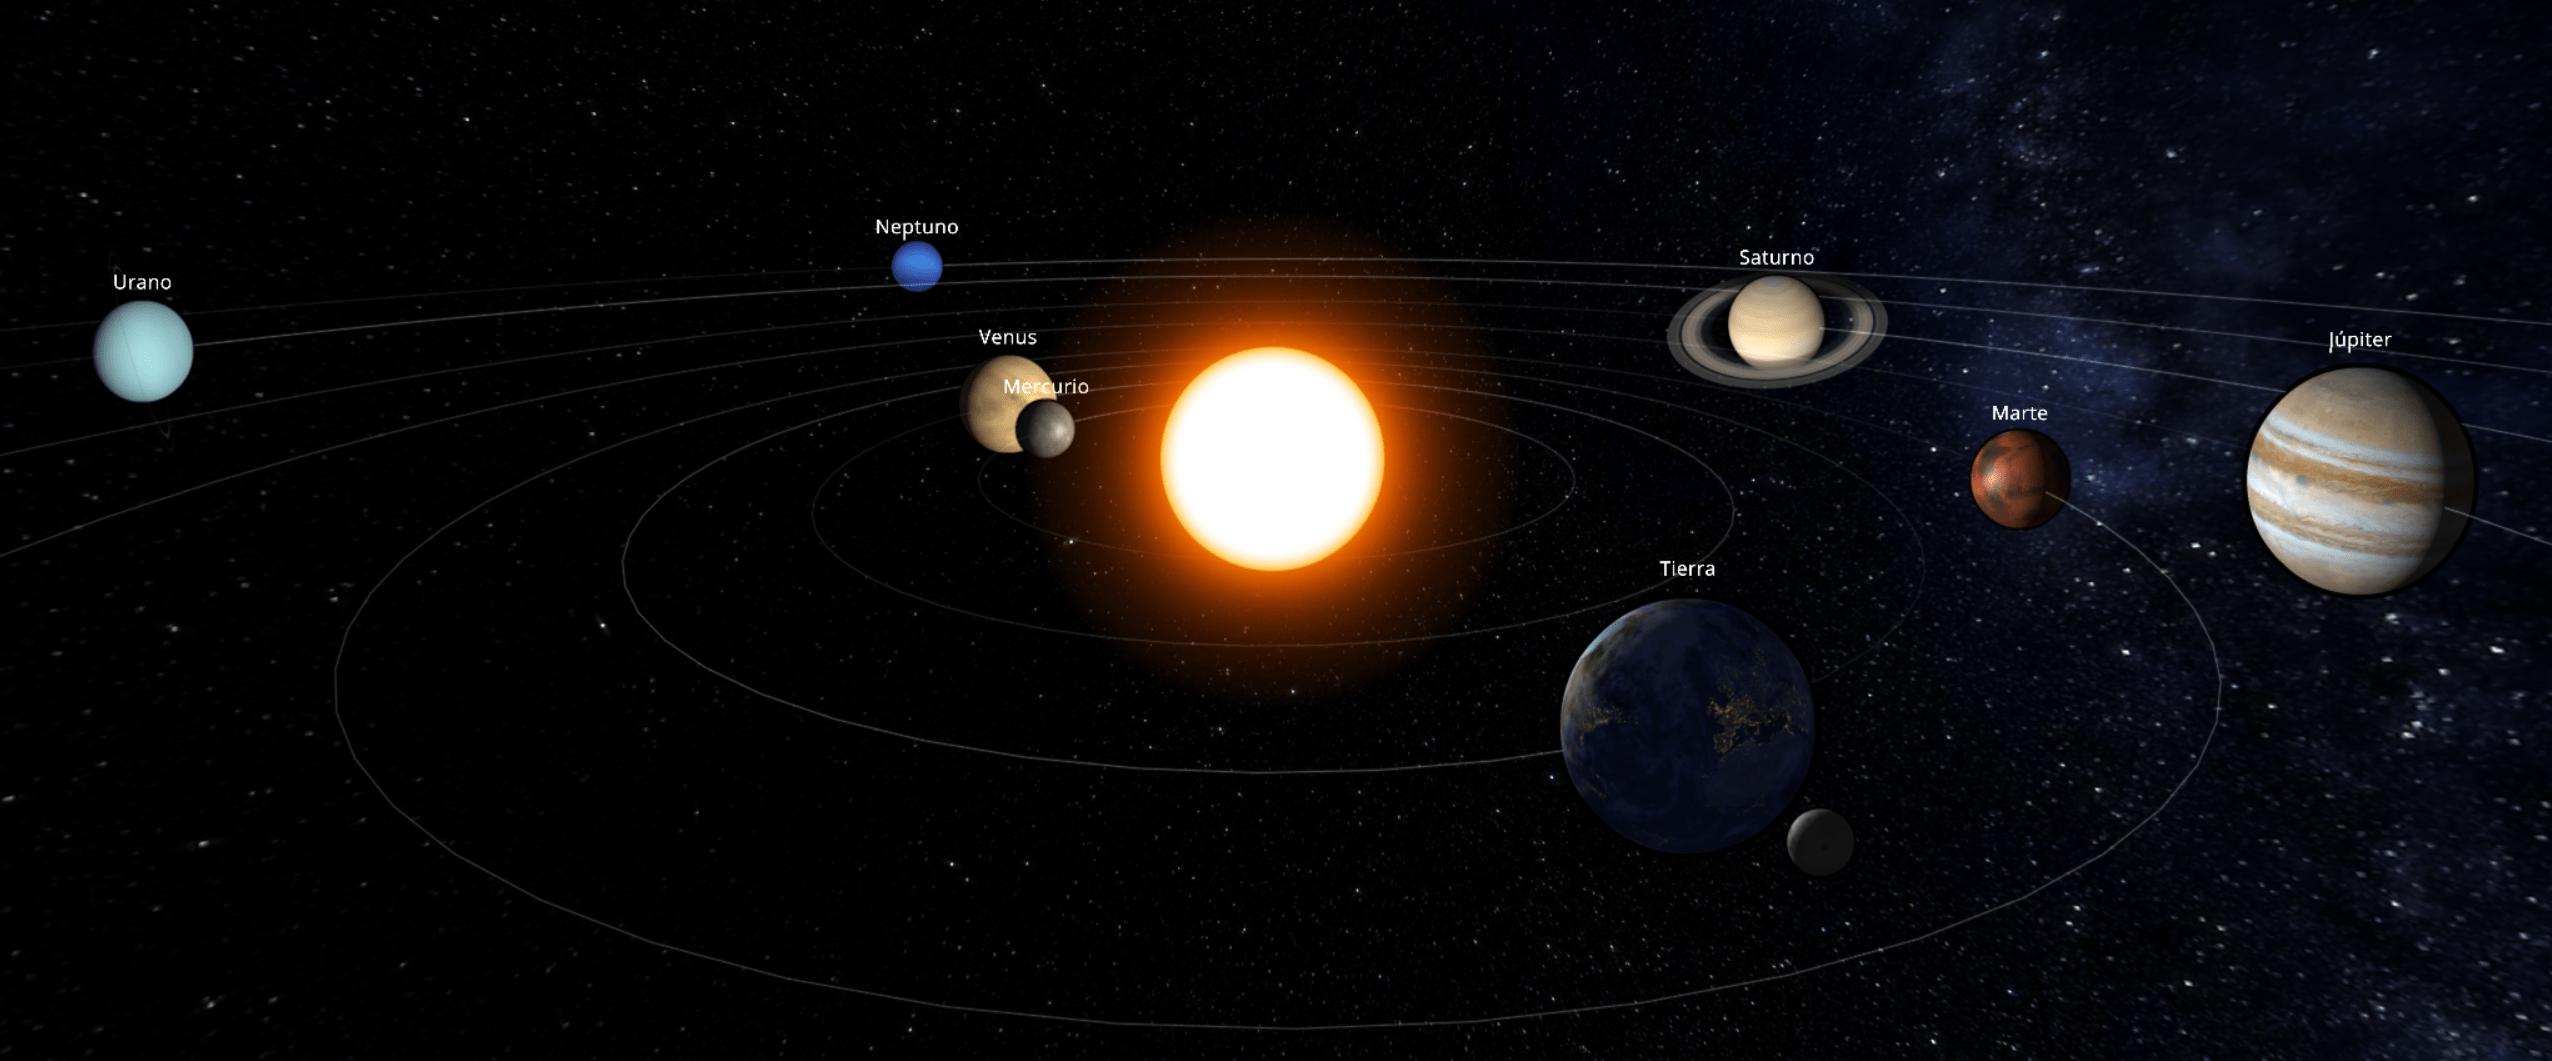 Efemérides astronómicas: Marzo 2018 - AstroAficion